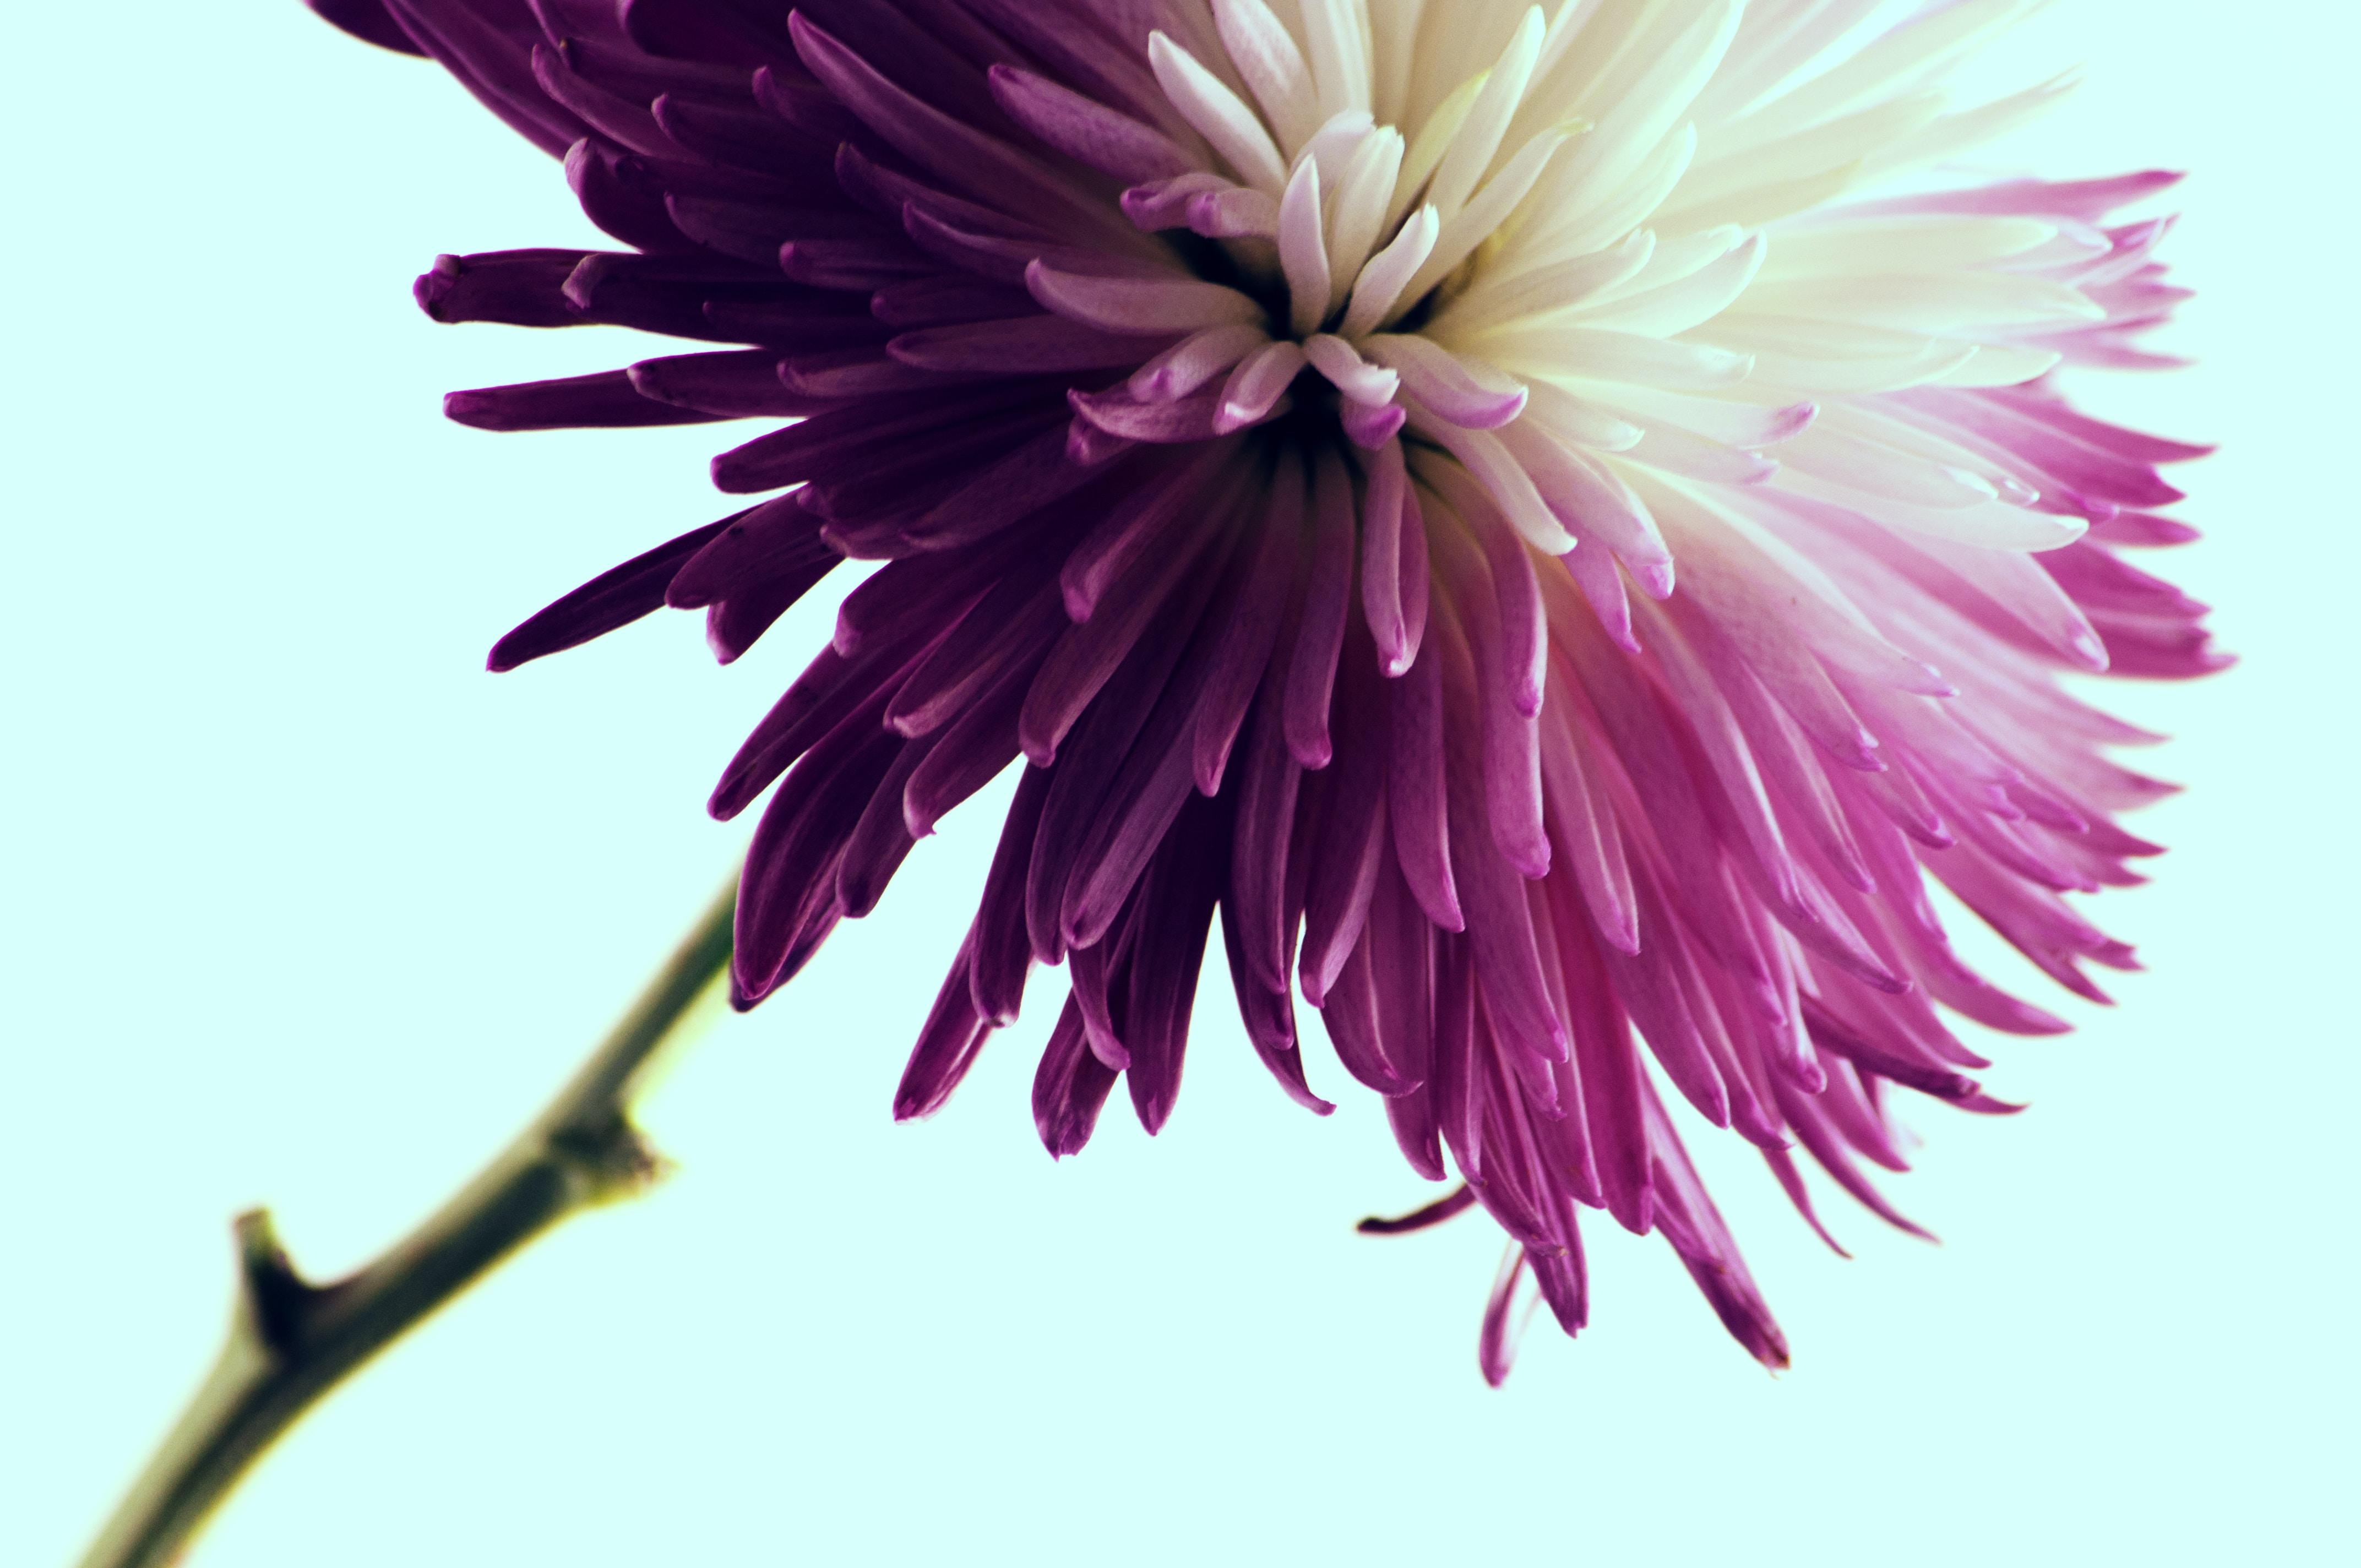 A macro shot of a purple dahlia flower with numerous long petals